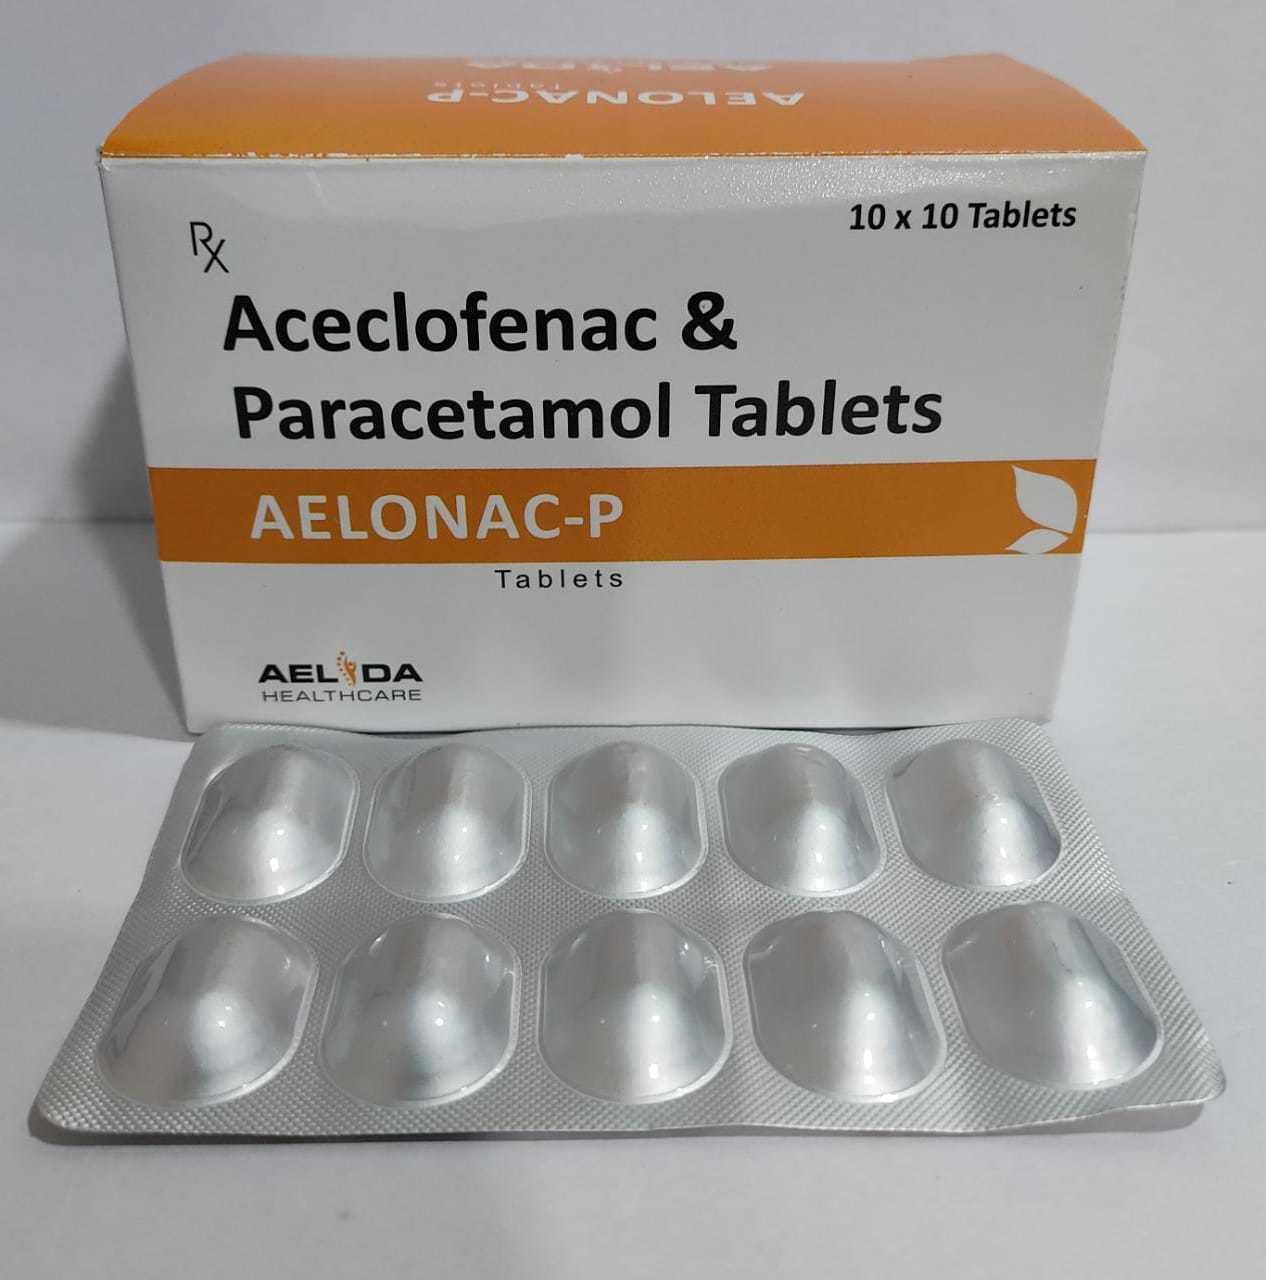 Aceclofenac paracetamol